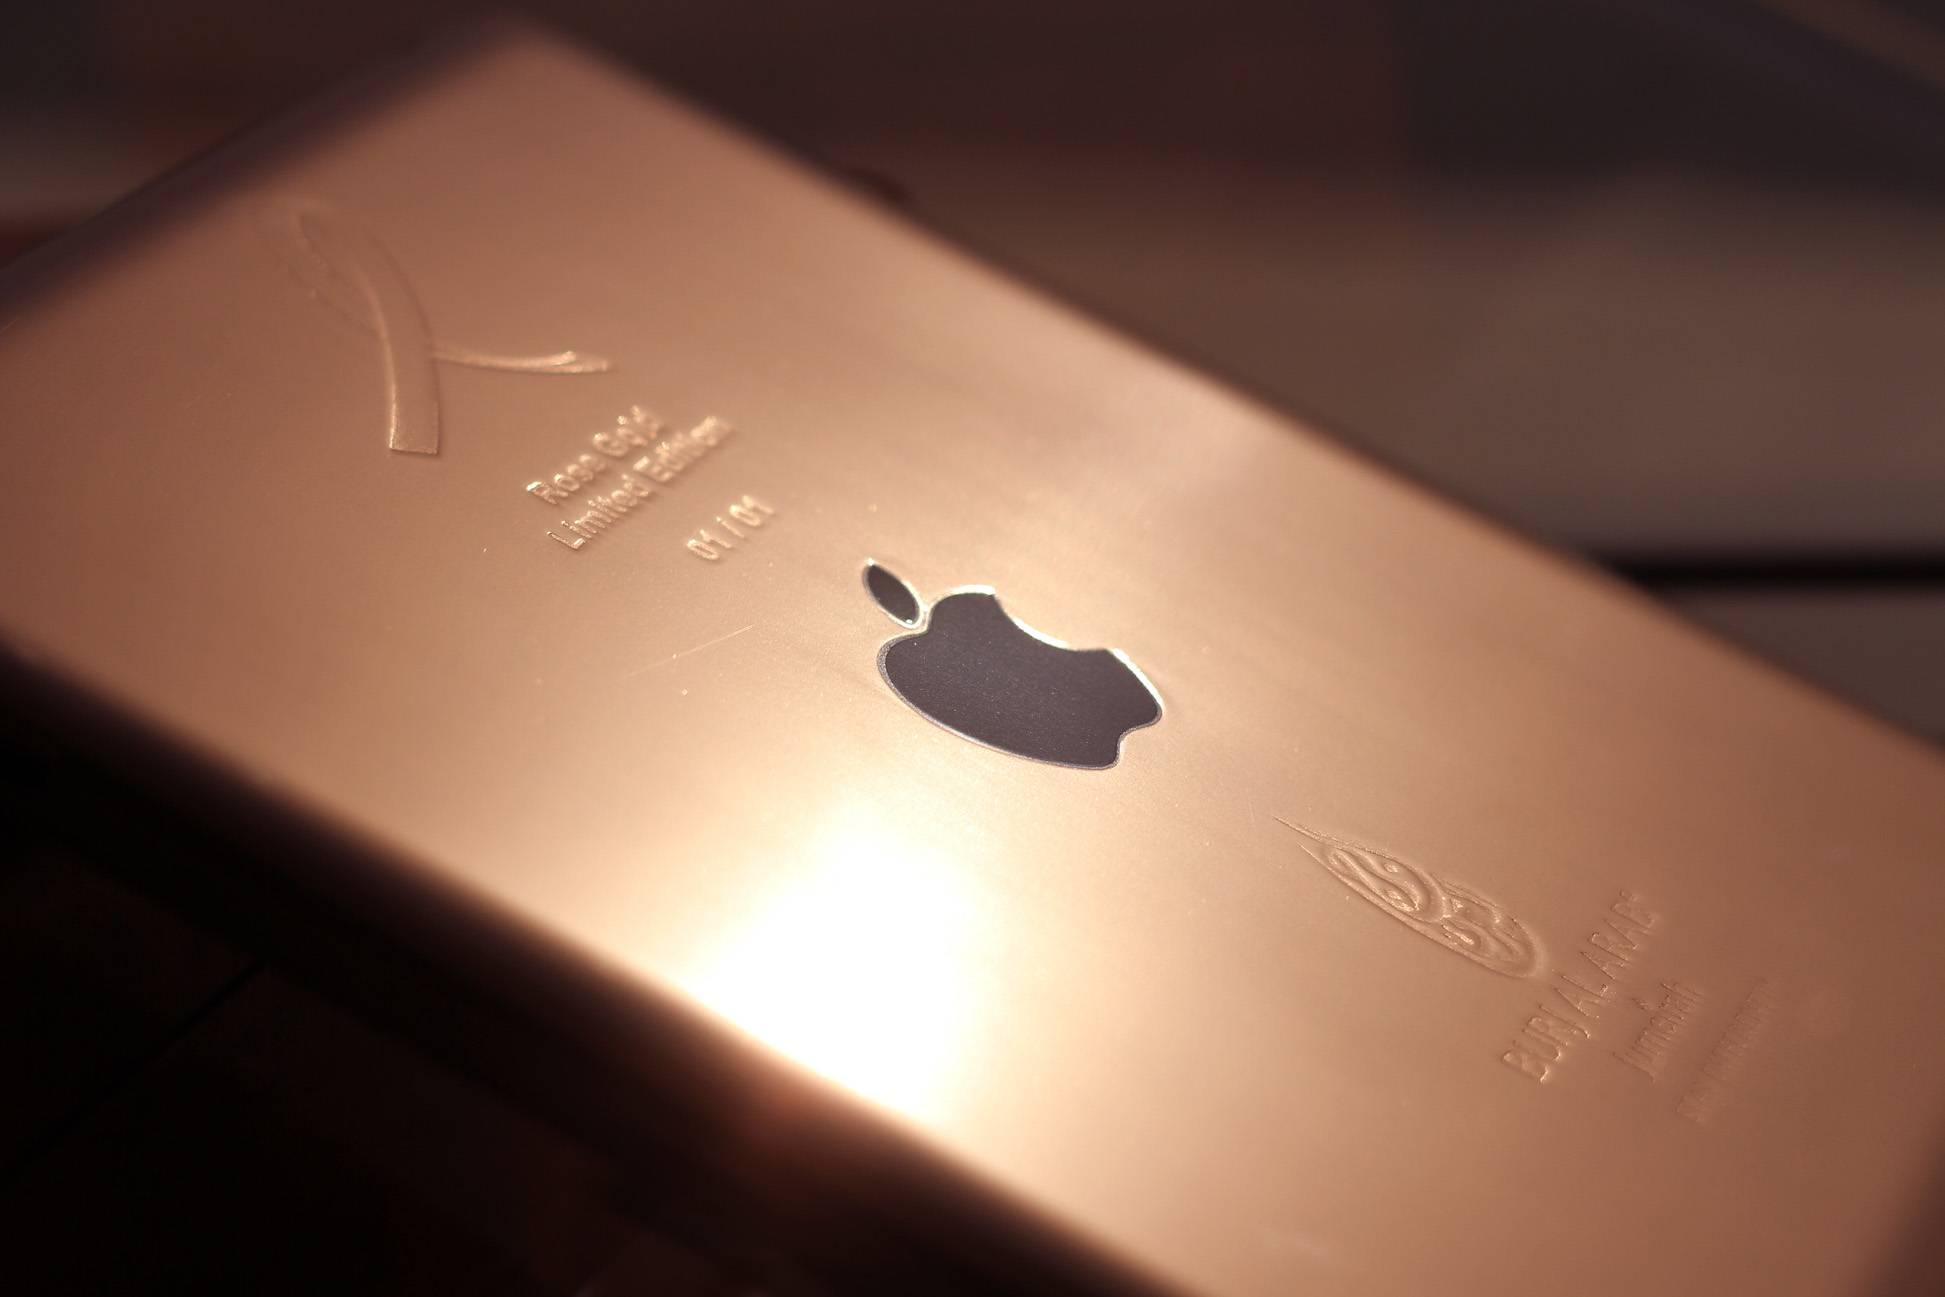 Burj Al Arab's 24-carat rose gold iPad